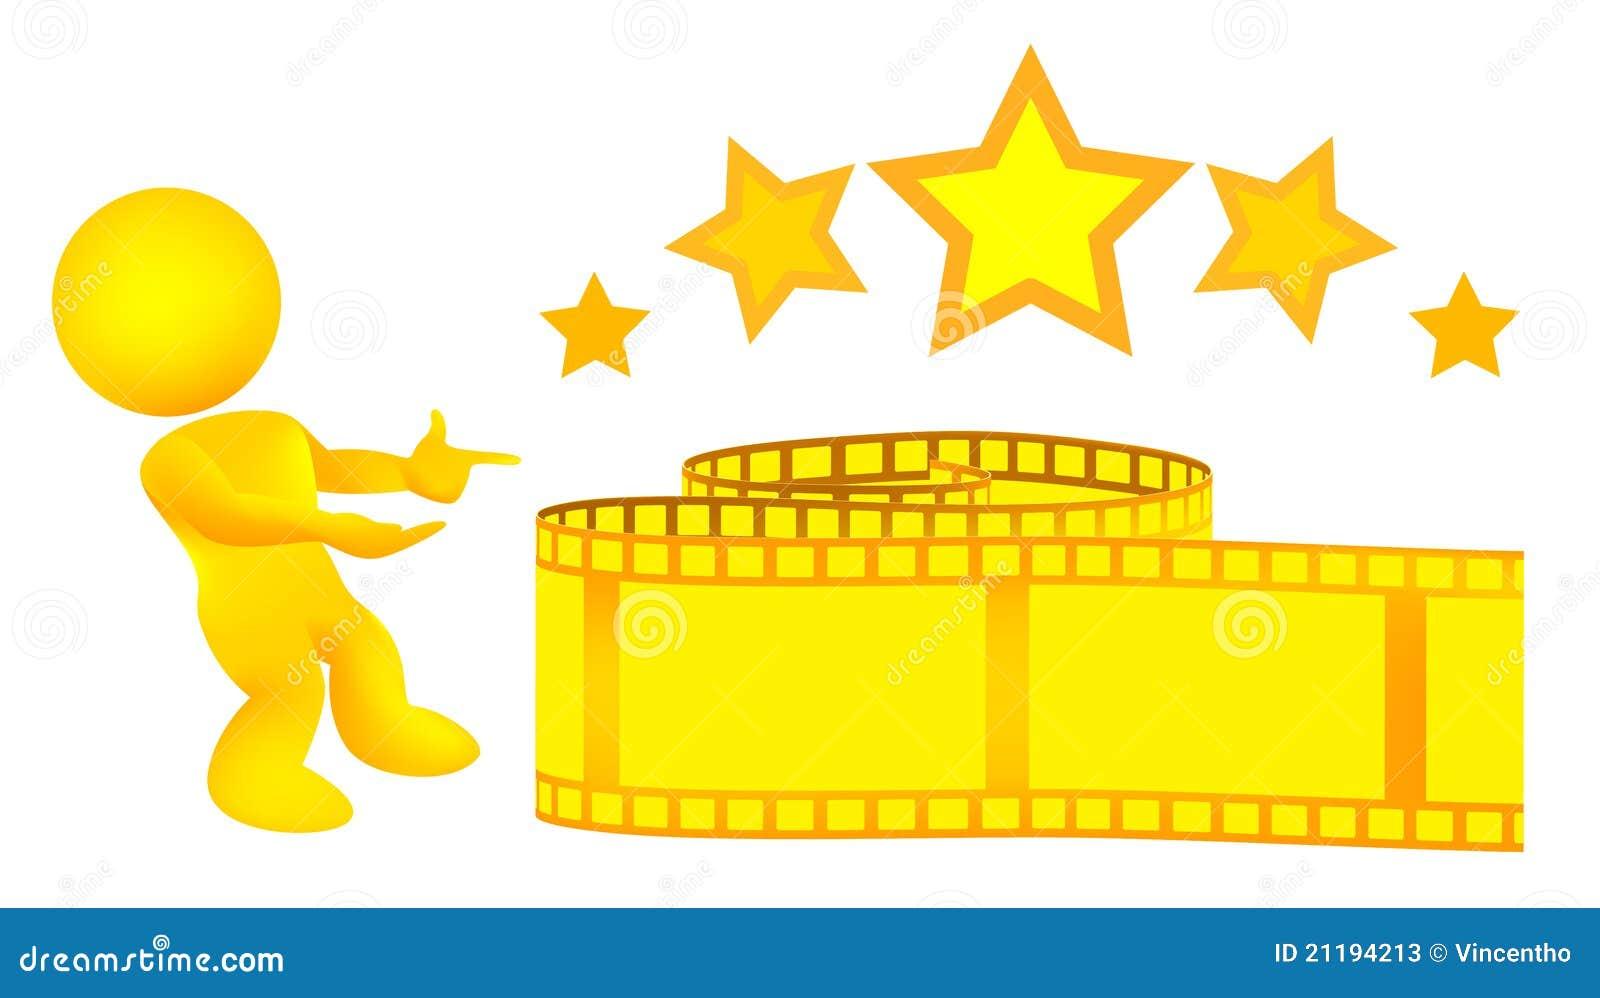 Man Introduces Gold Yellow Film Strip Illustration